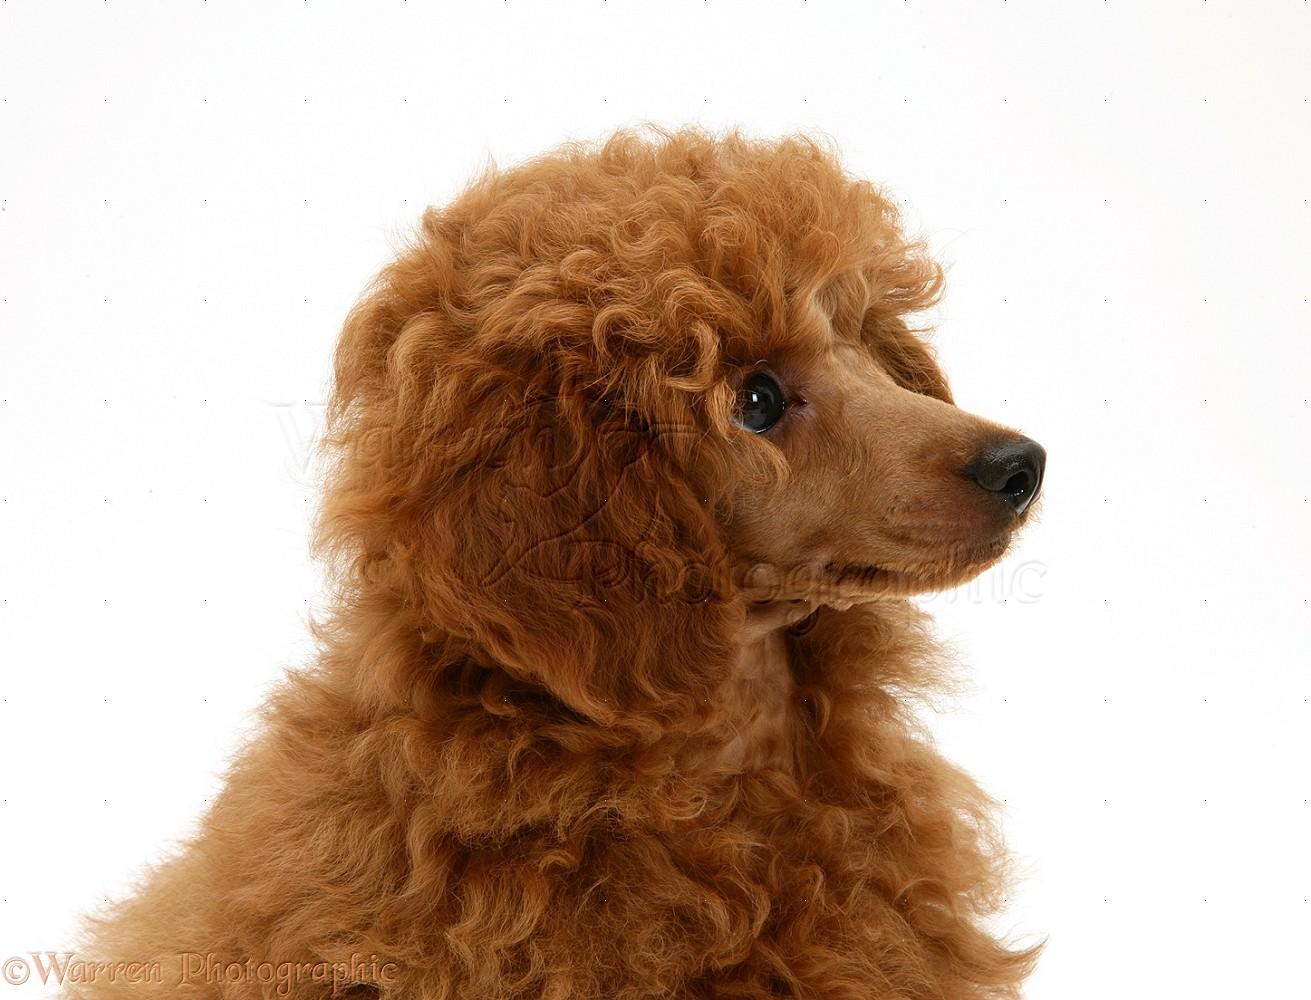 WP17190 Red Toy Poodle pup Reggie 12 weeks old 1311x1000